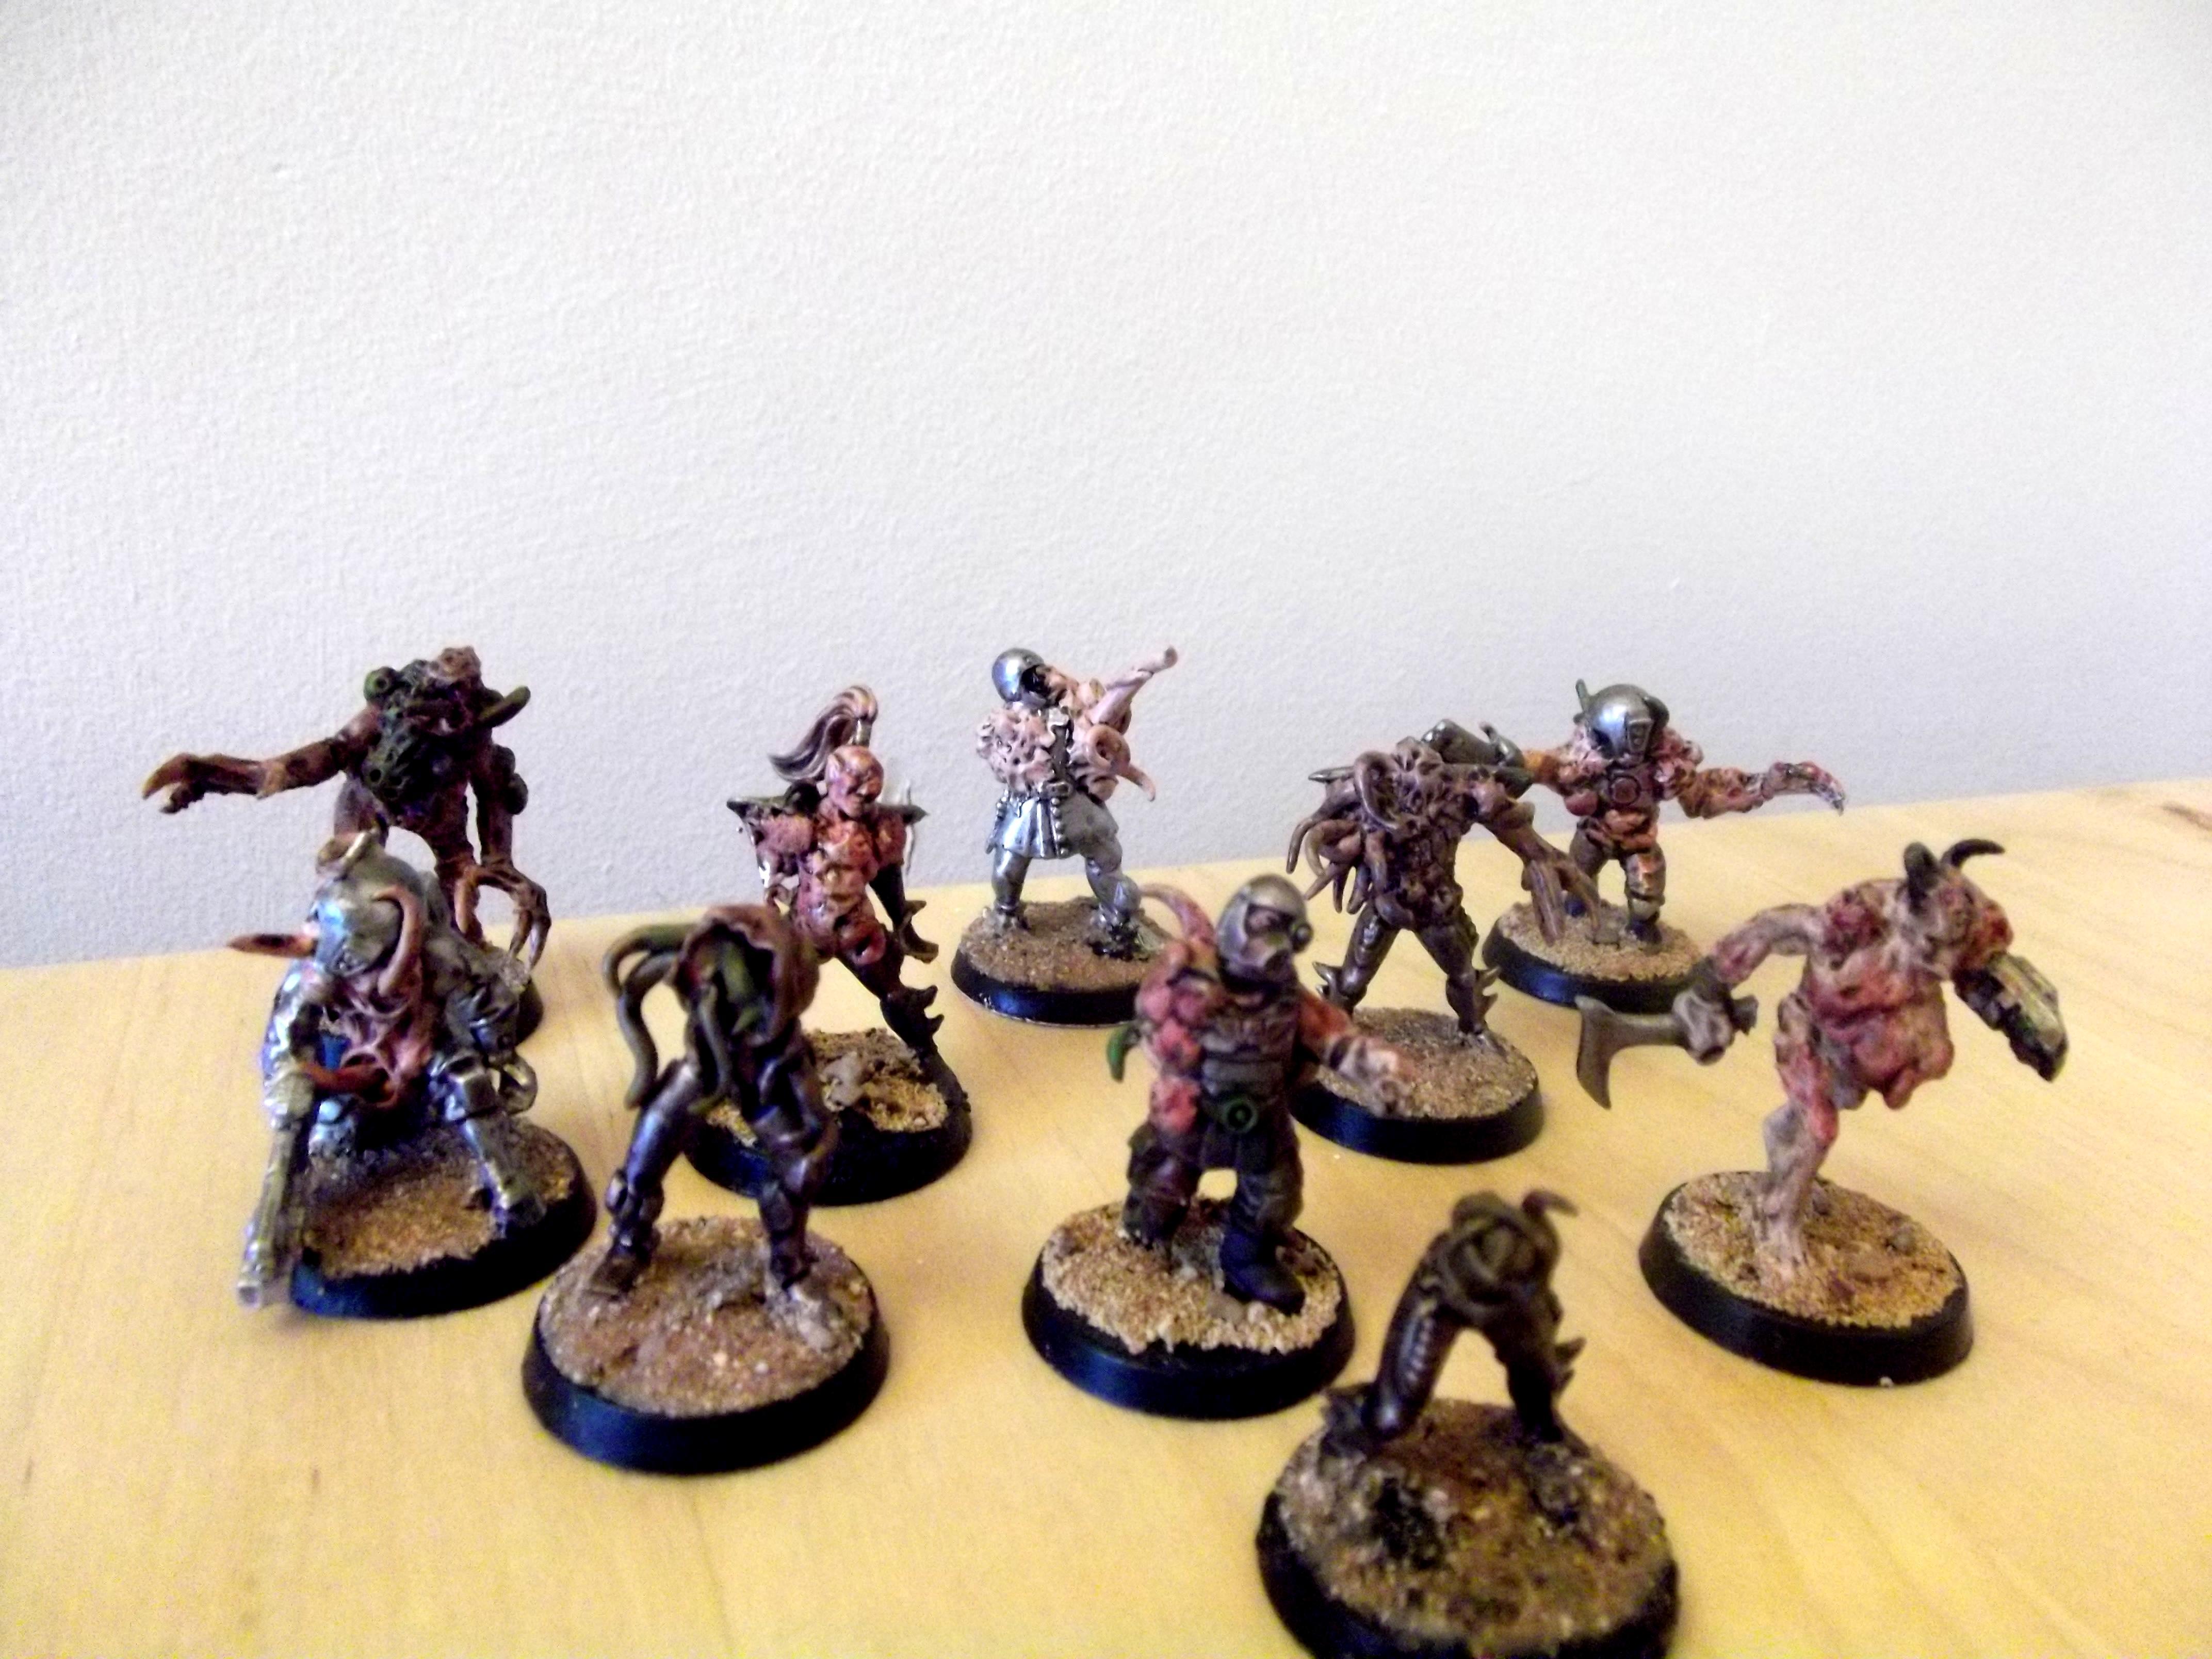 Army, Conversion, Greenstuff, Nurgle, Plague Zombies, Sculpted, Warhammer 40,000, Warhammer Fantasy